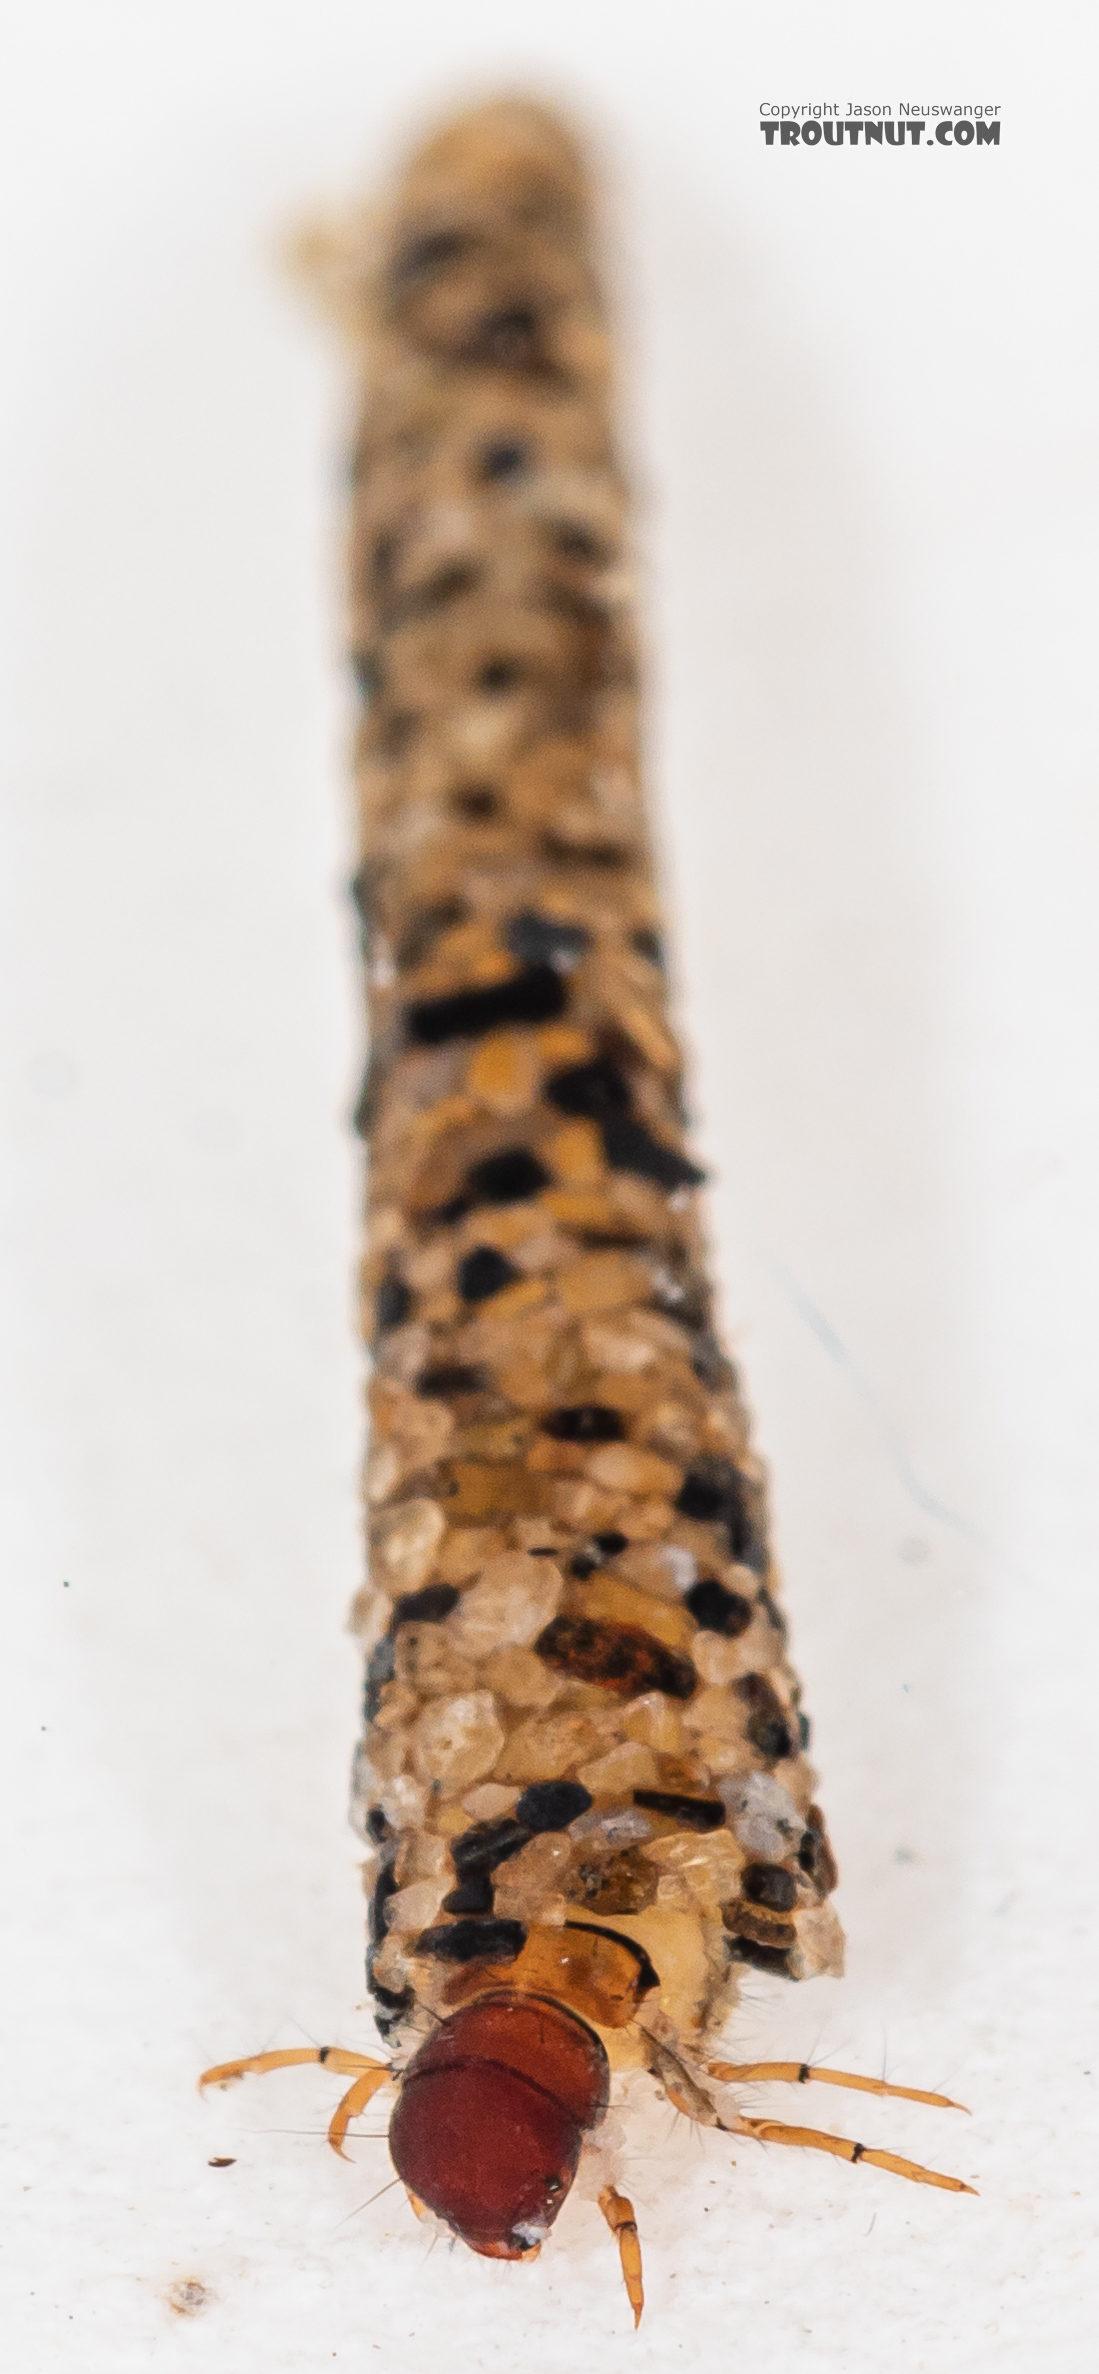 Lepidostoma (Little Brown Sedges) Little Brown Sedge Larva from Mystery Creek #199 in Washington